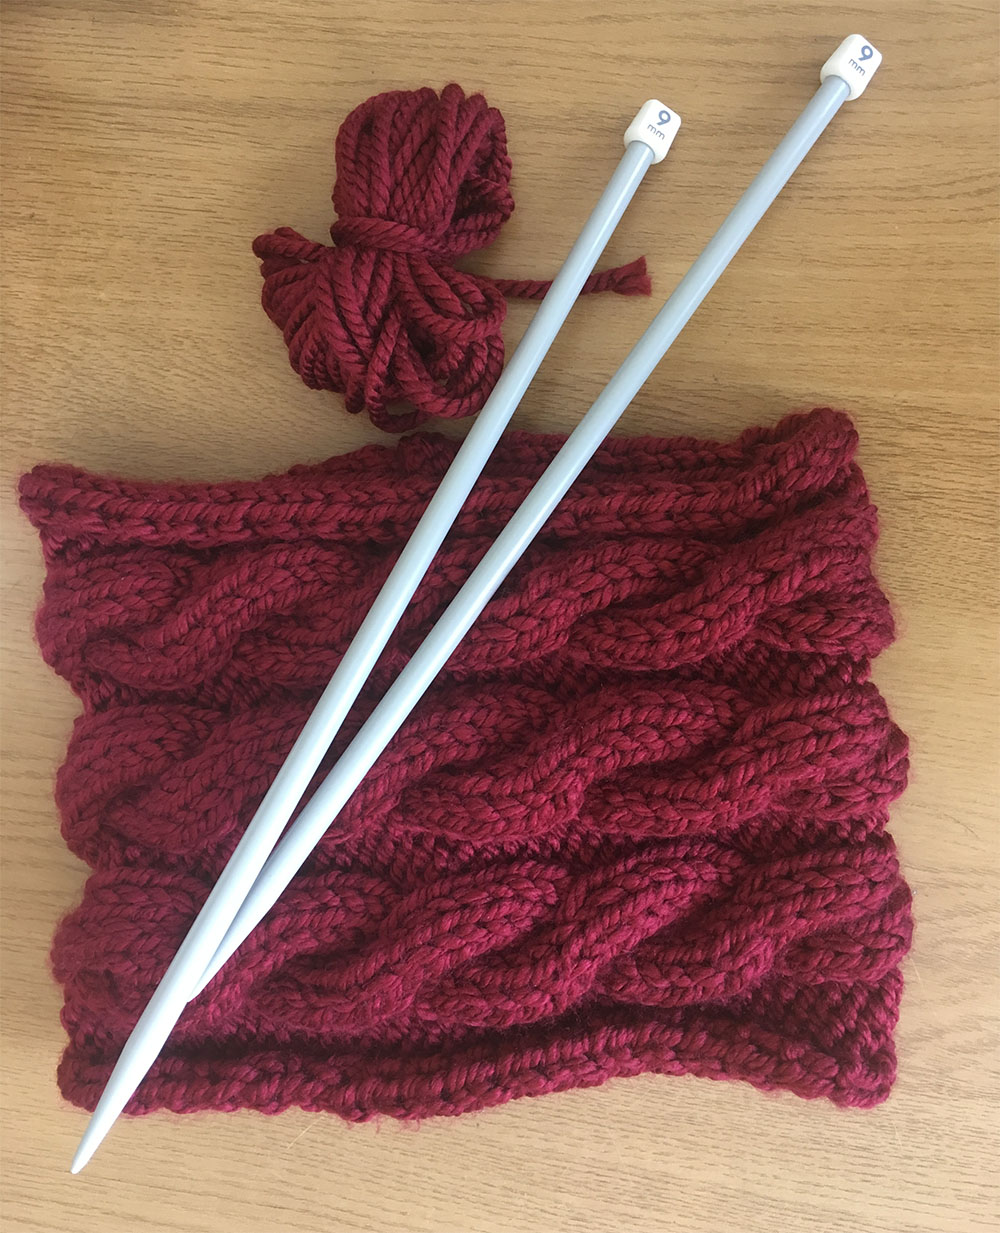 BLUEi crafts - knitting, crochet, weaving, macrame.